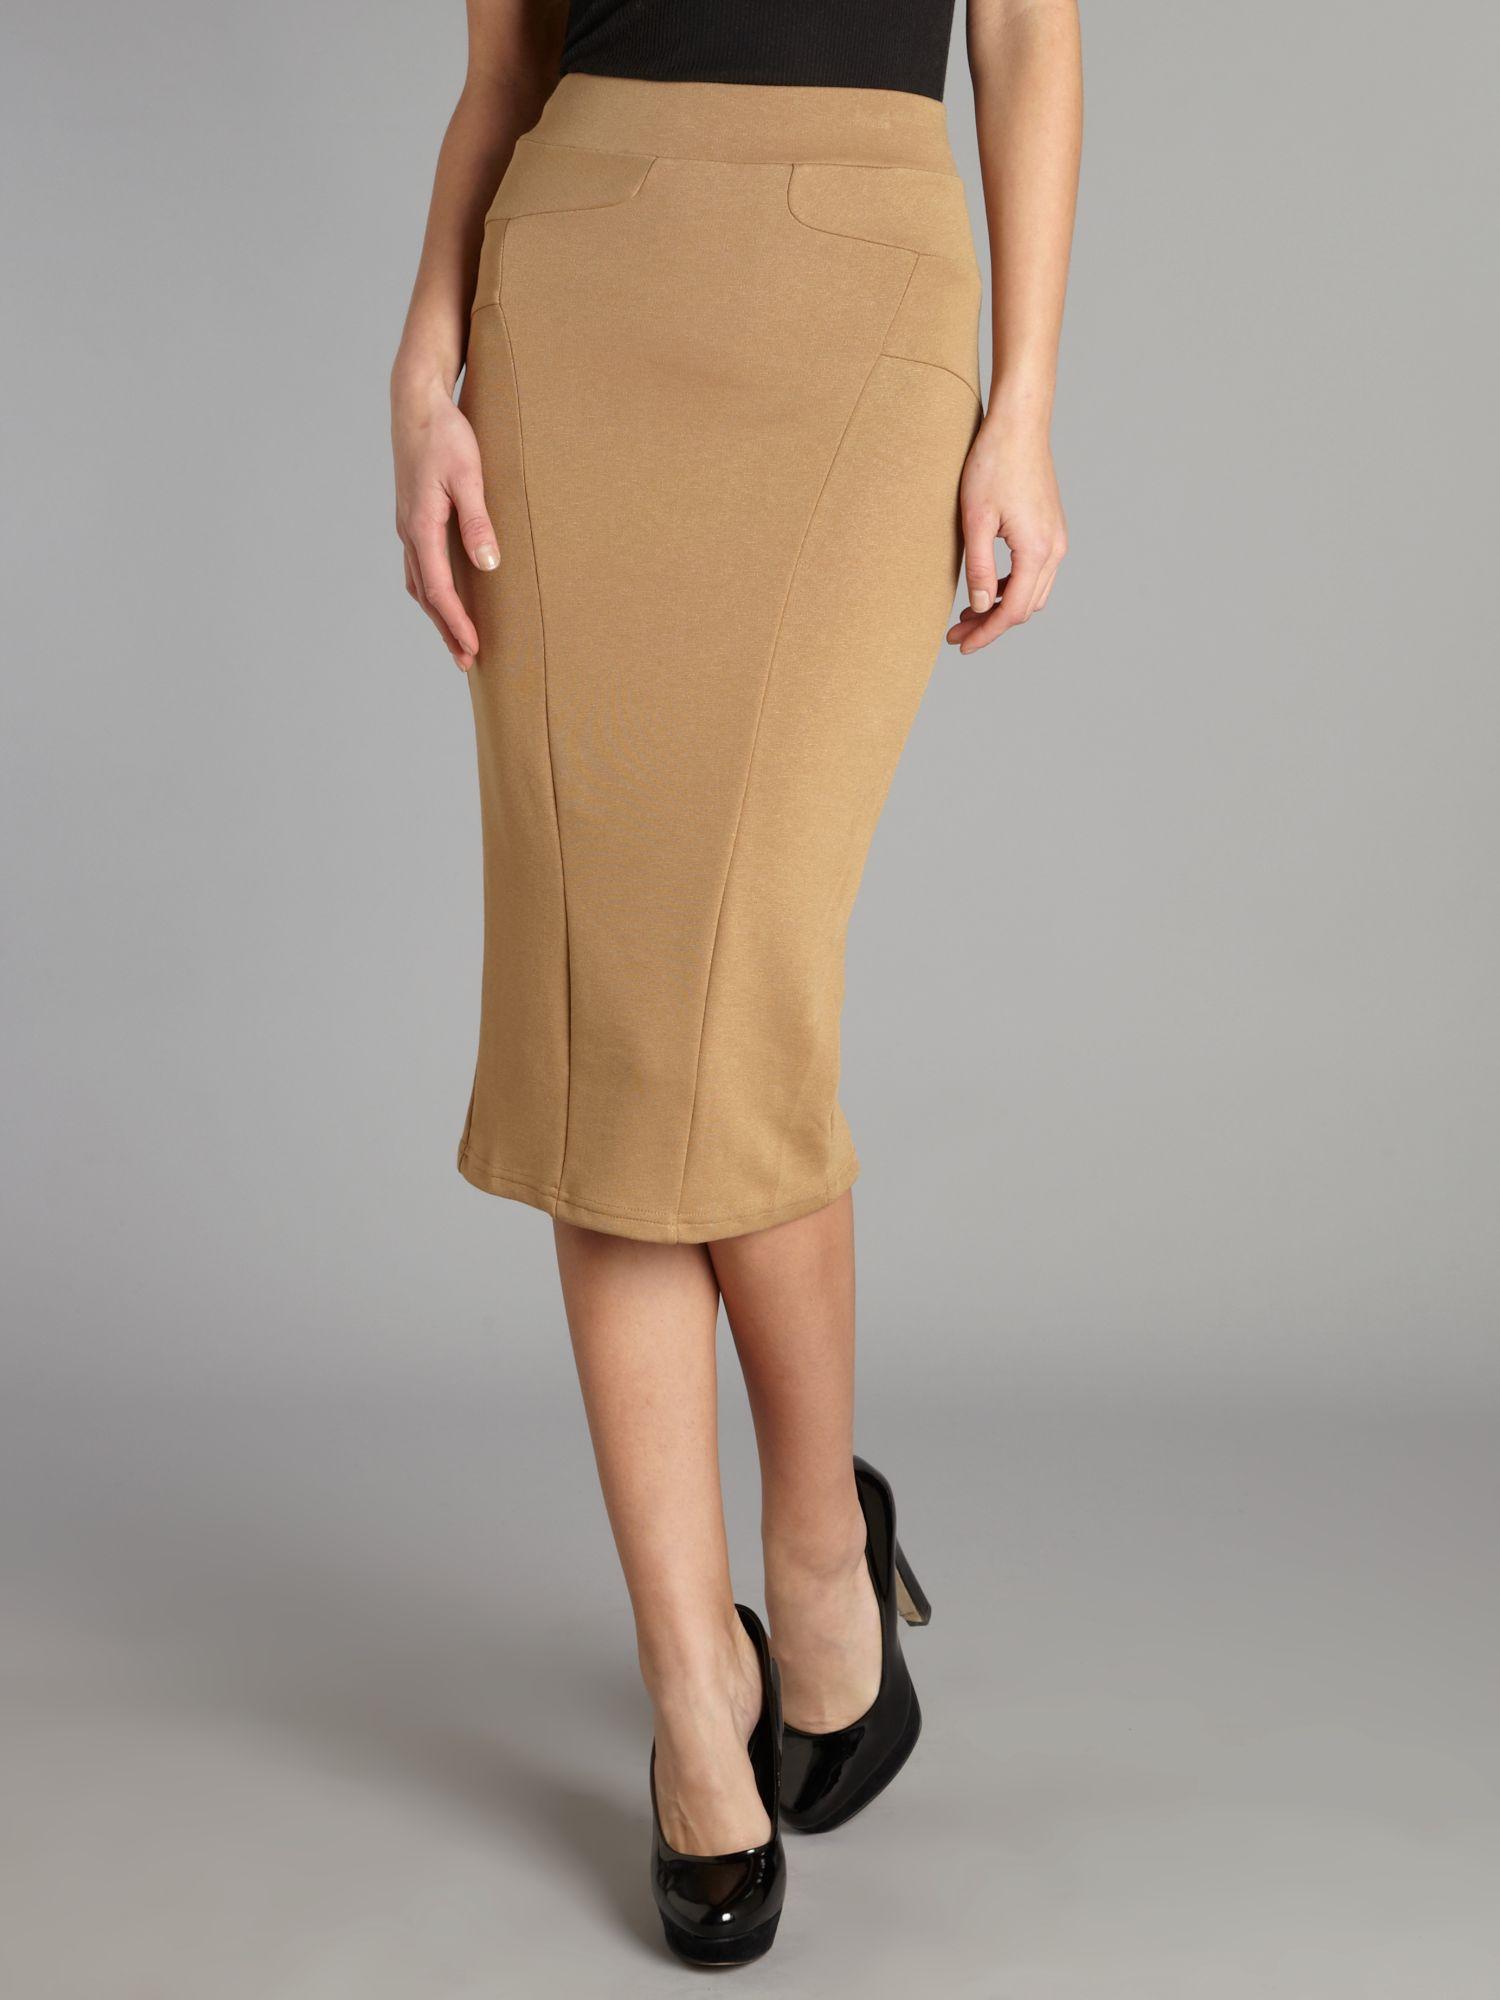 Tfnc london Midi Pencil Skirt in Brown | Lyst